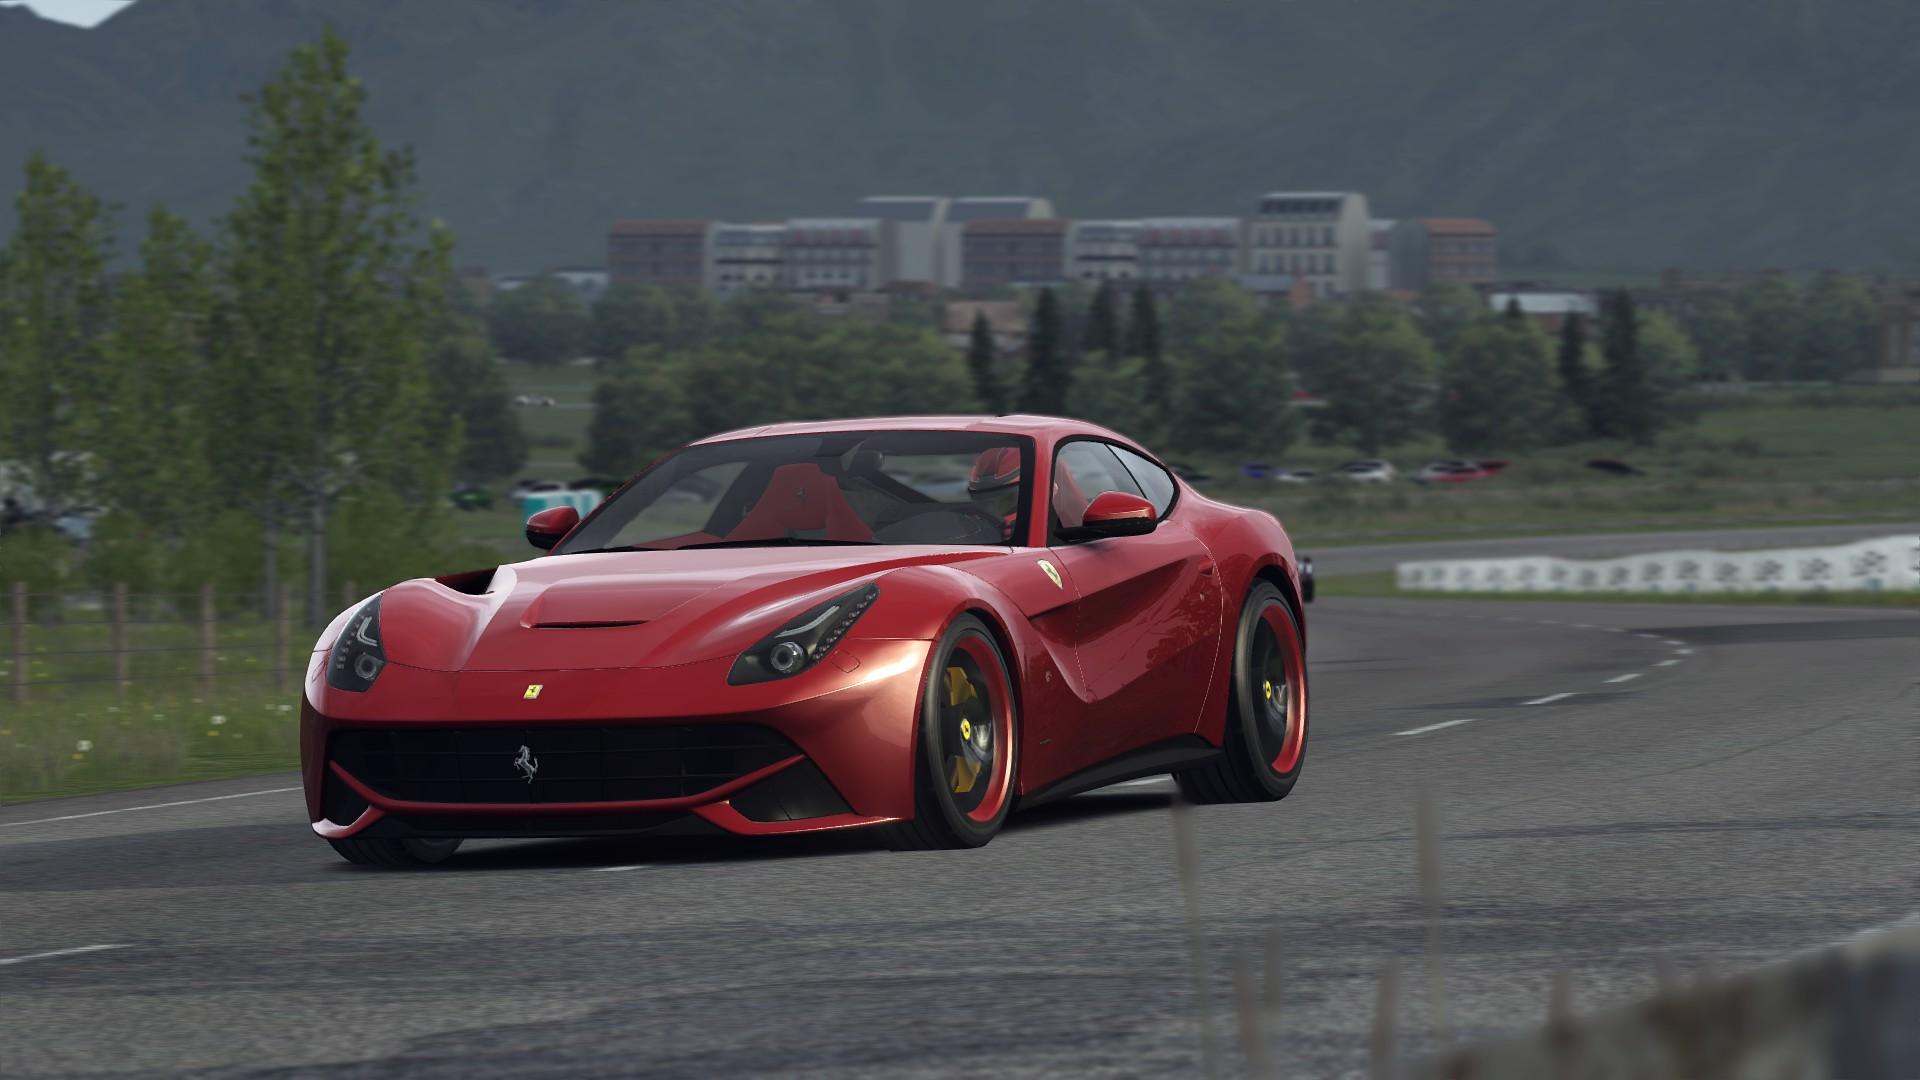 Ferrari F12 Berlinetta Assetto Corsa 1.14 055.jpg